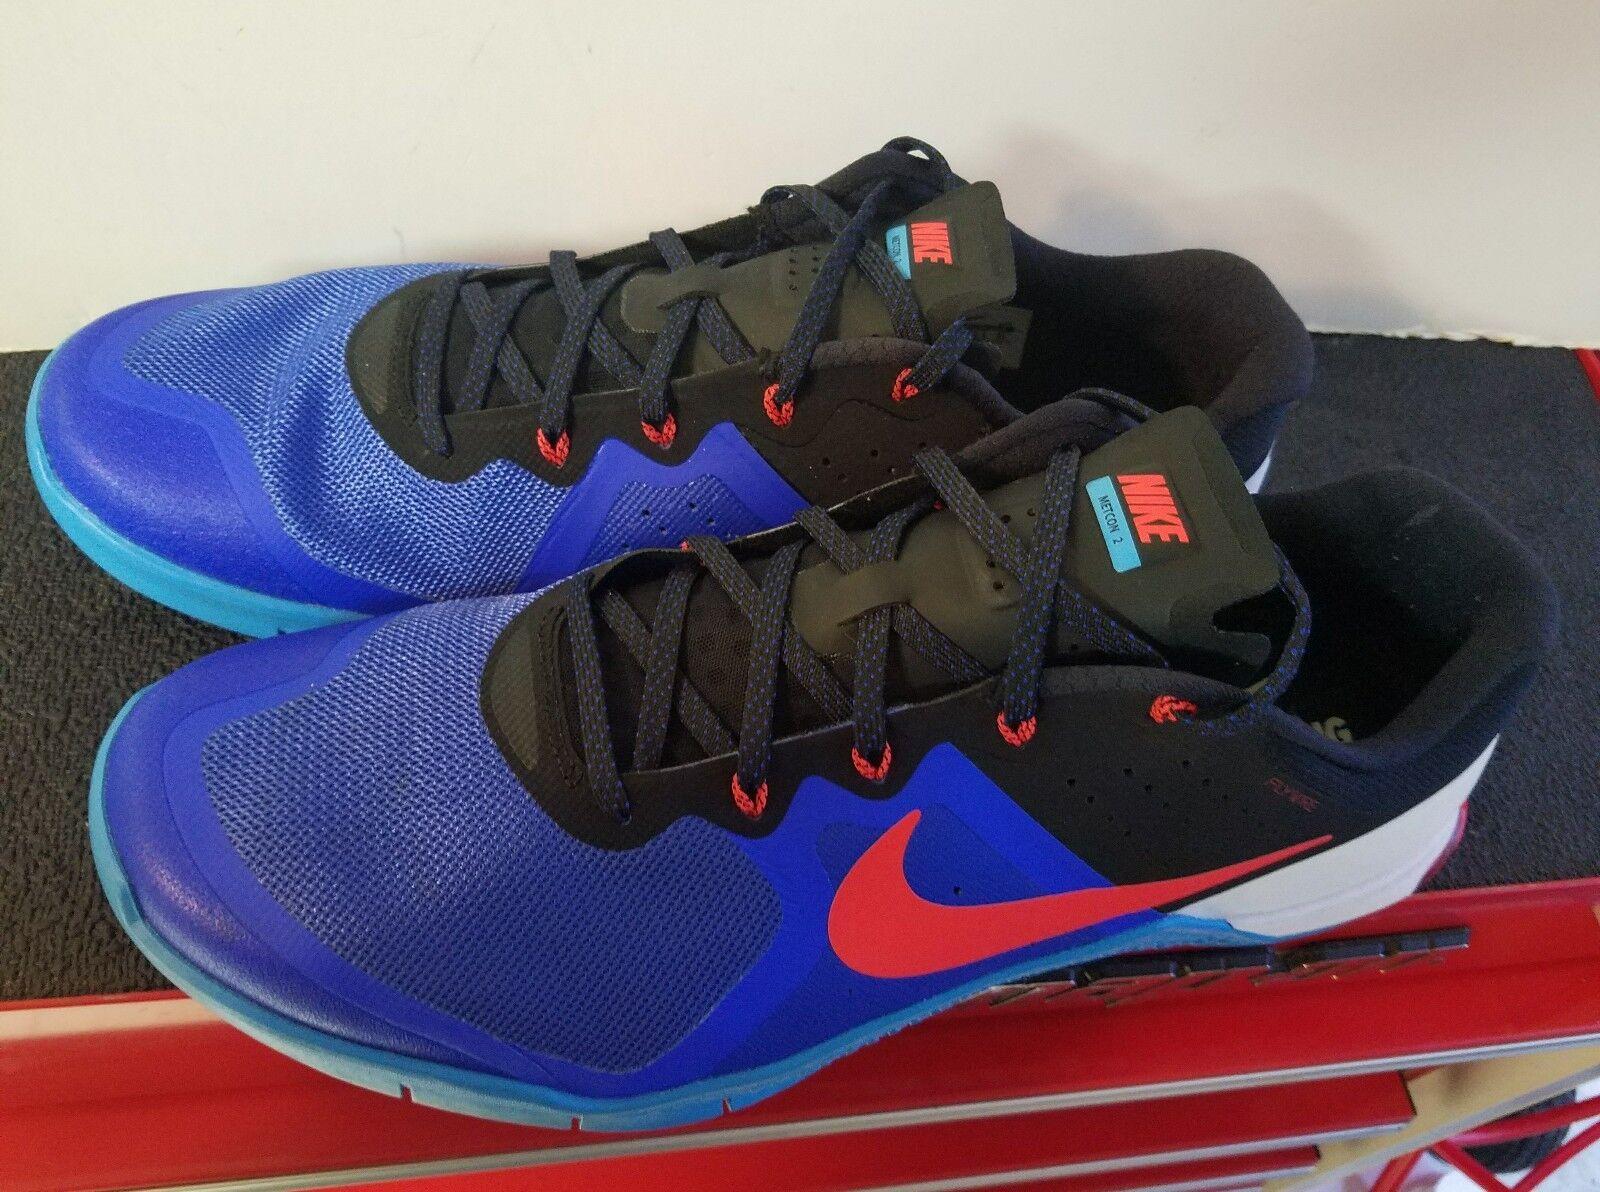 Nike Metcon 2 Fly Wire Men's 15 Racer Blue Black Crimson Style 819899-464